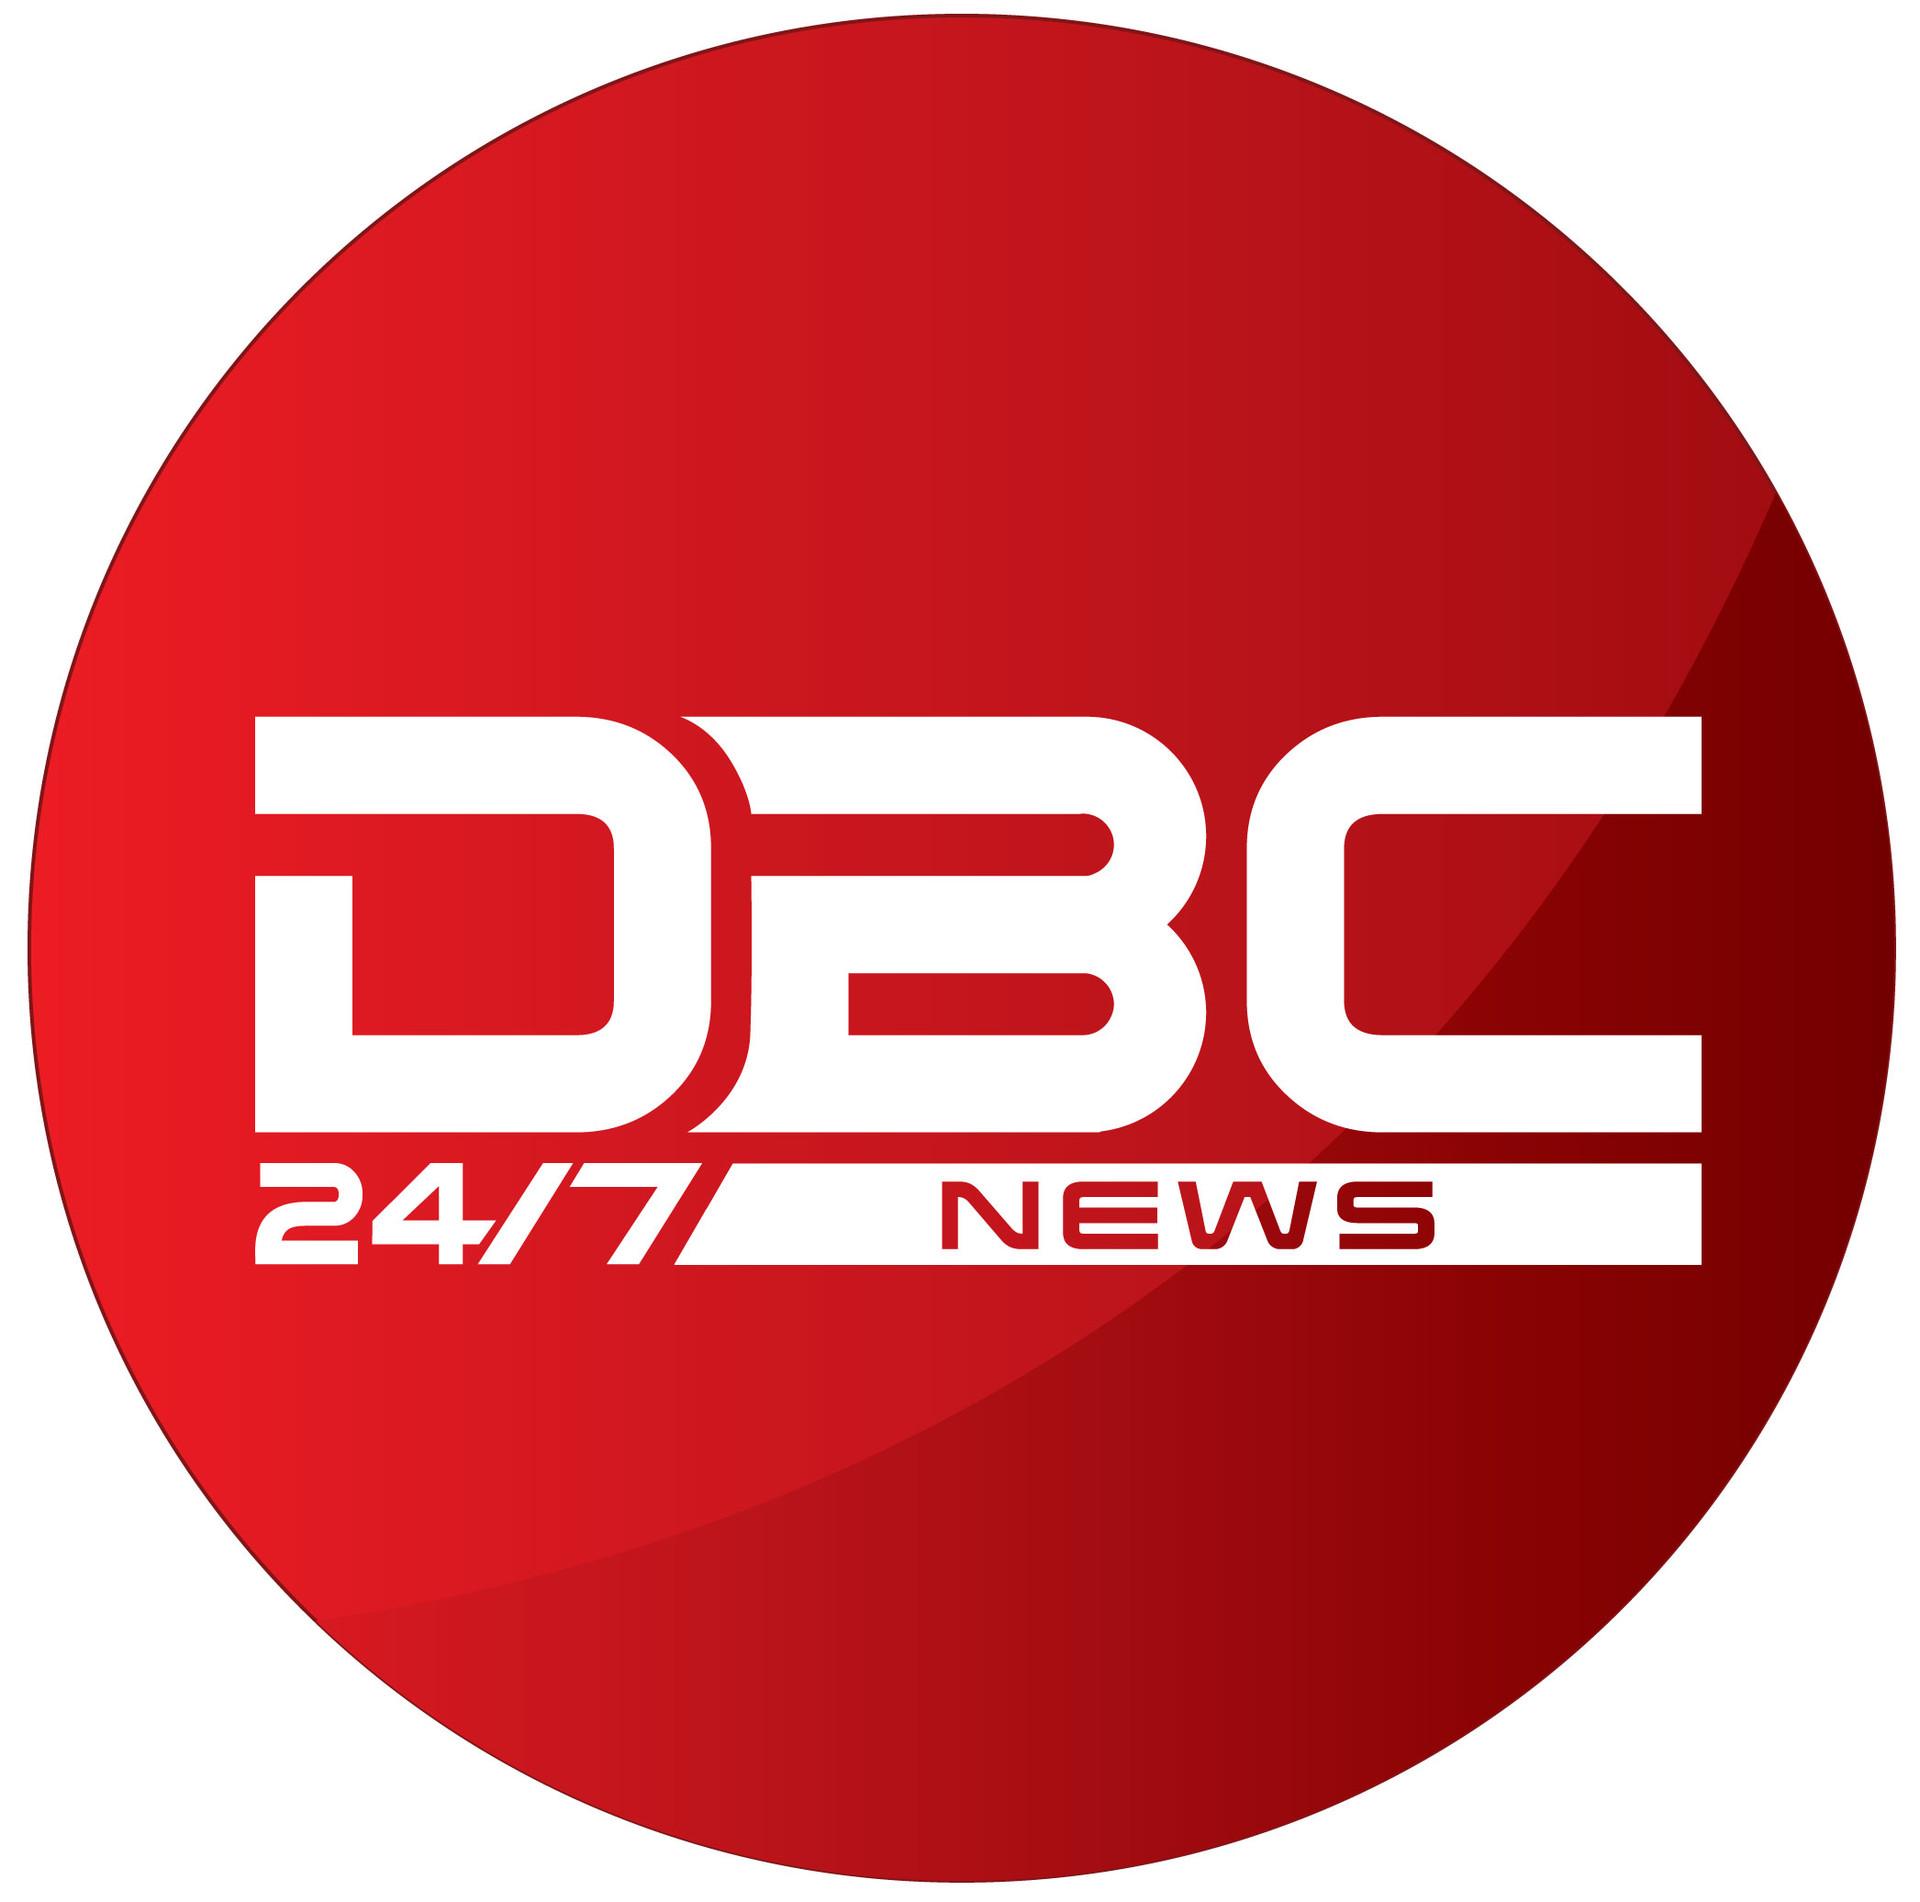 DBC NEWS